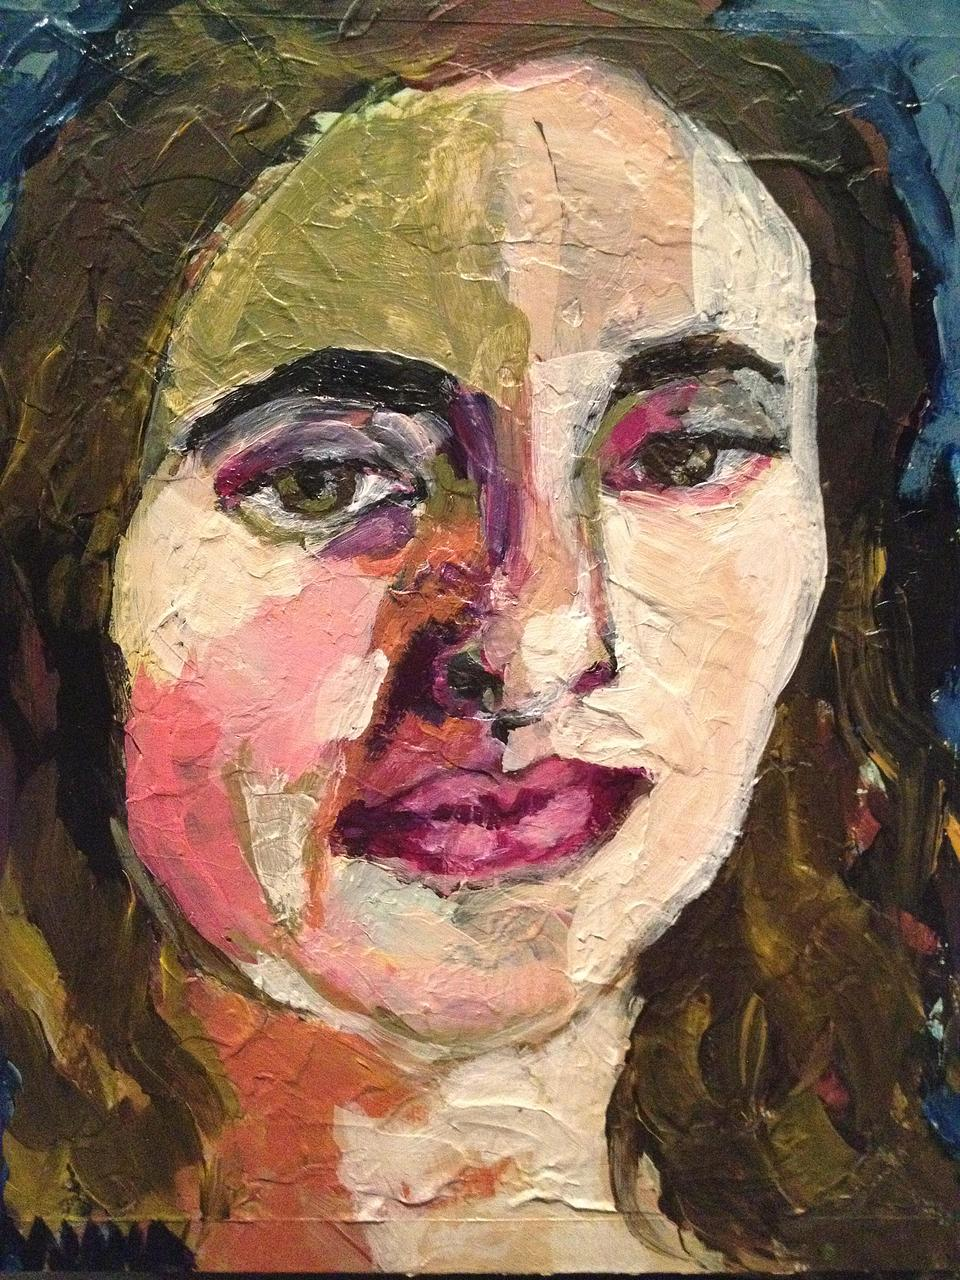 self+portrait+2+correct+rotation+full.JPG